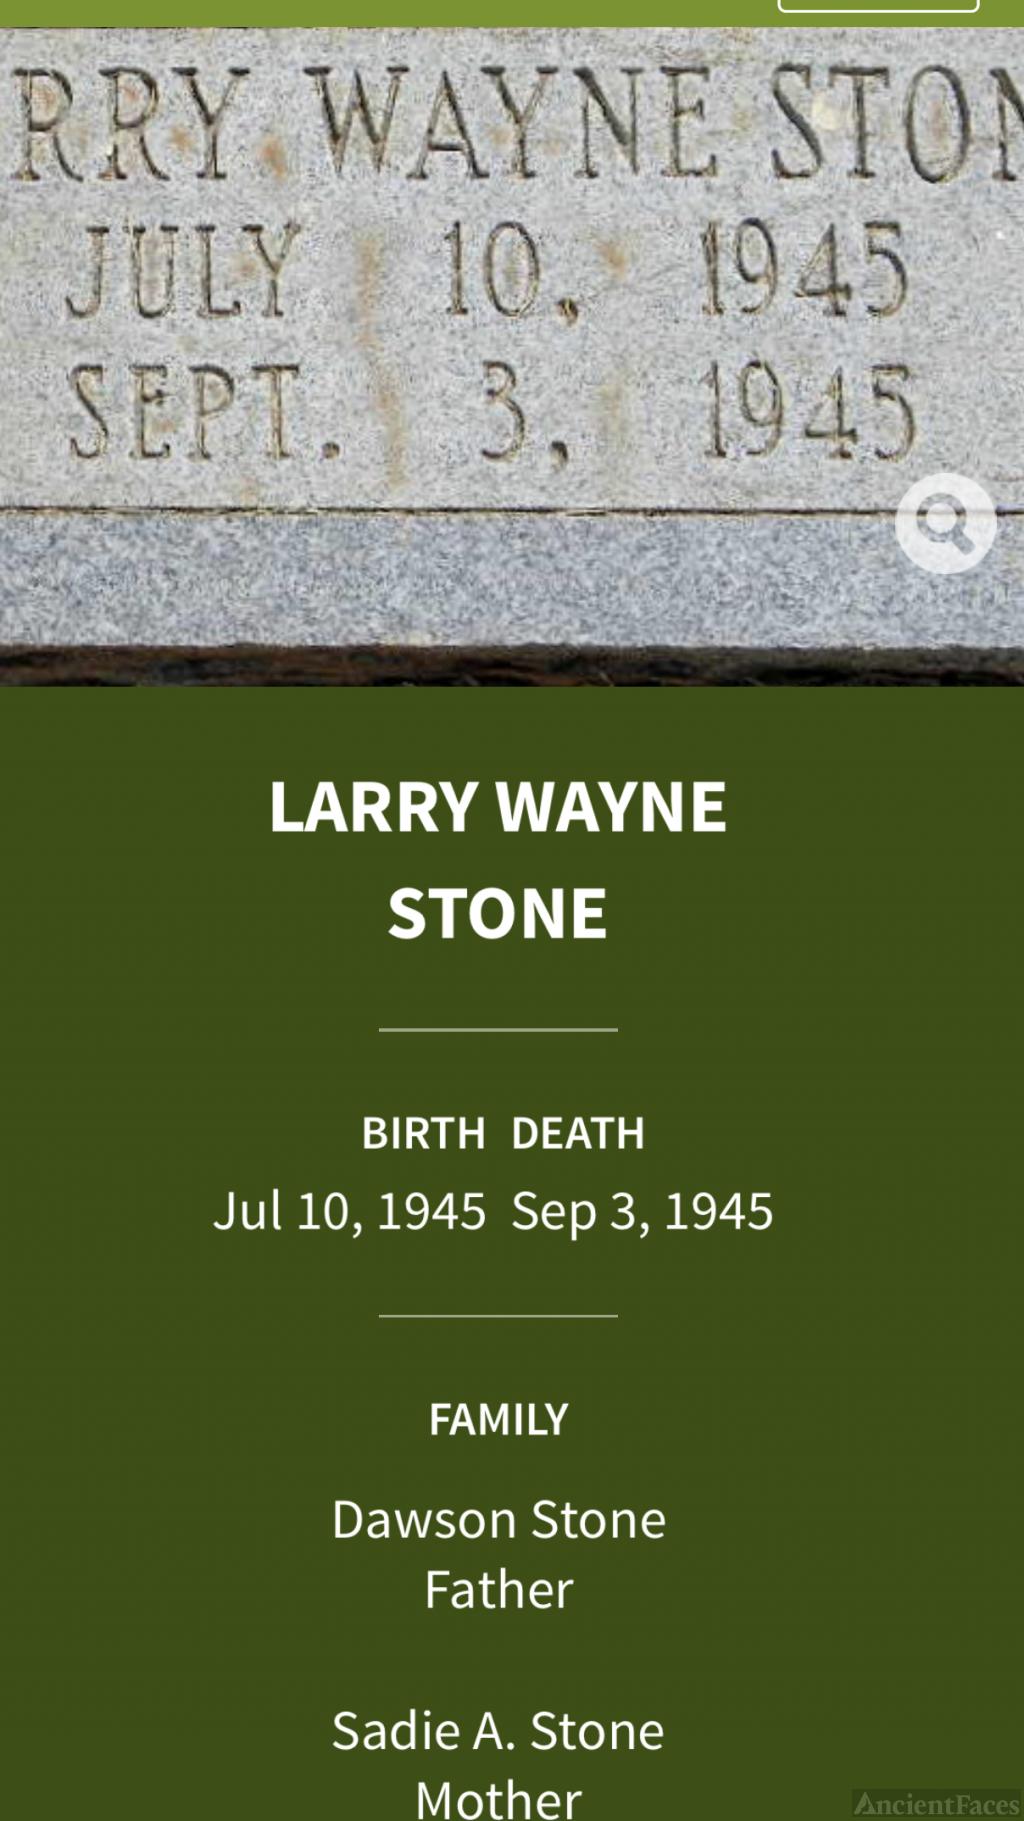 Larry Wayne Stone Gravesite